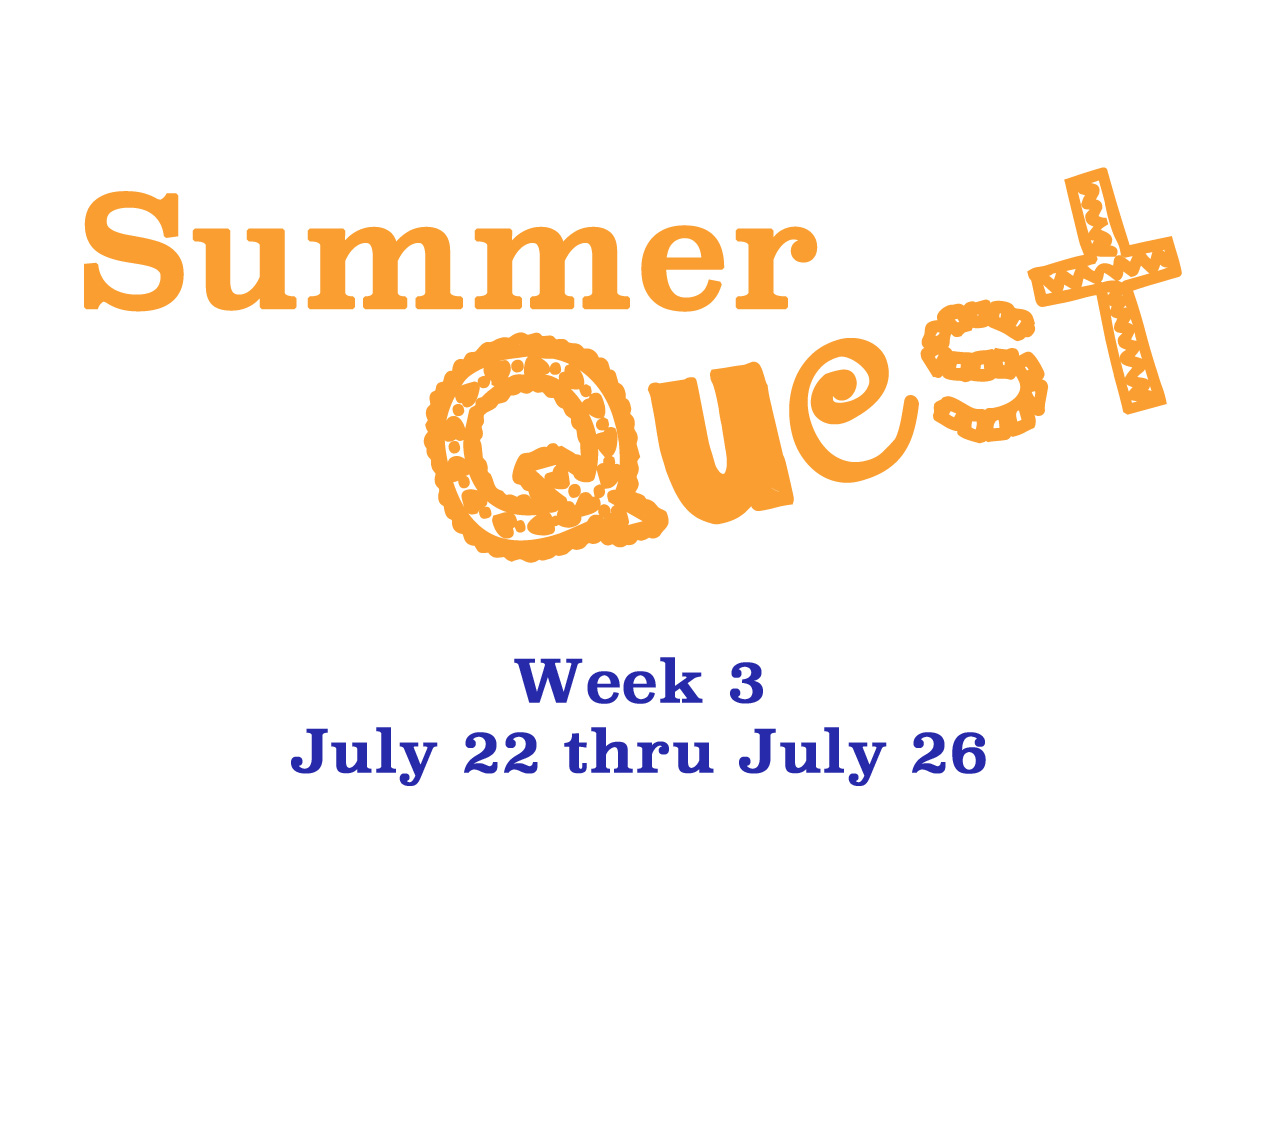 Summer Quest Logo_week 3 2019square.jpg